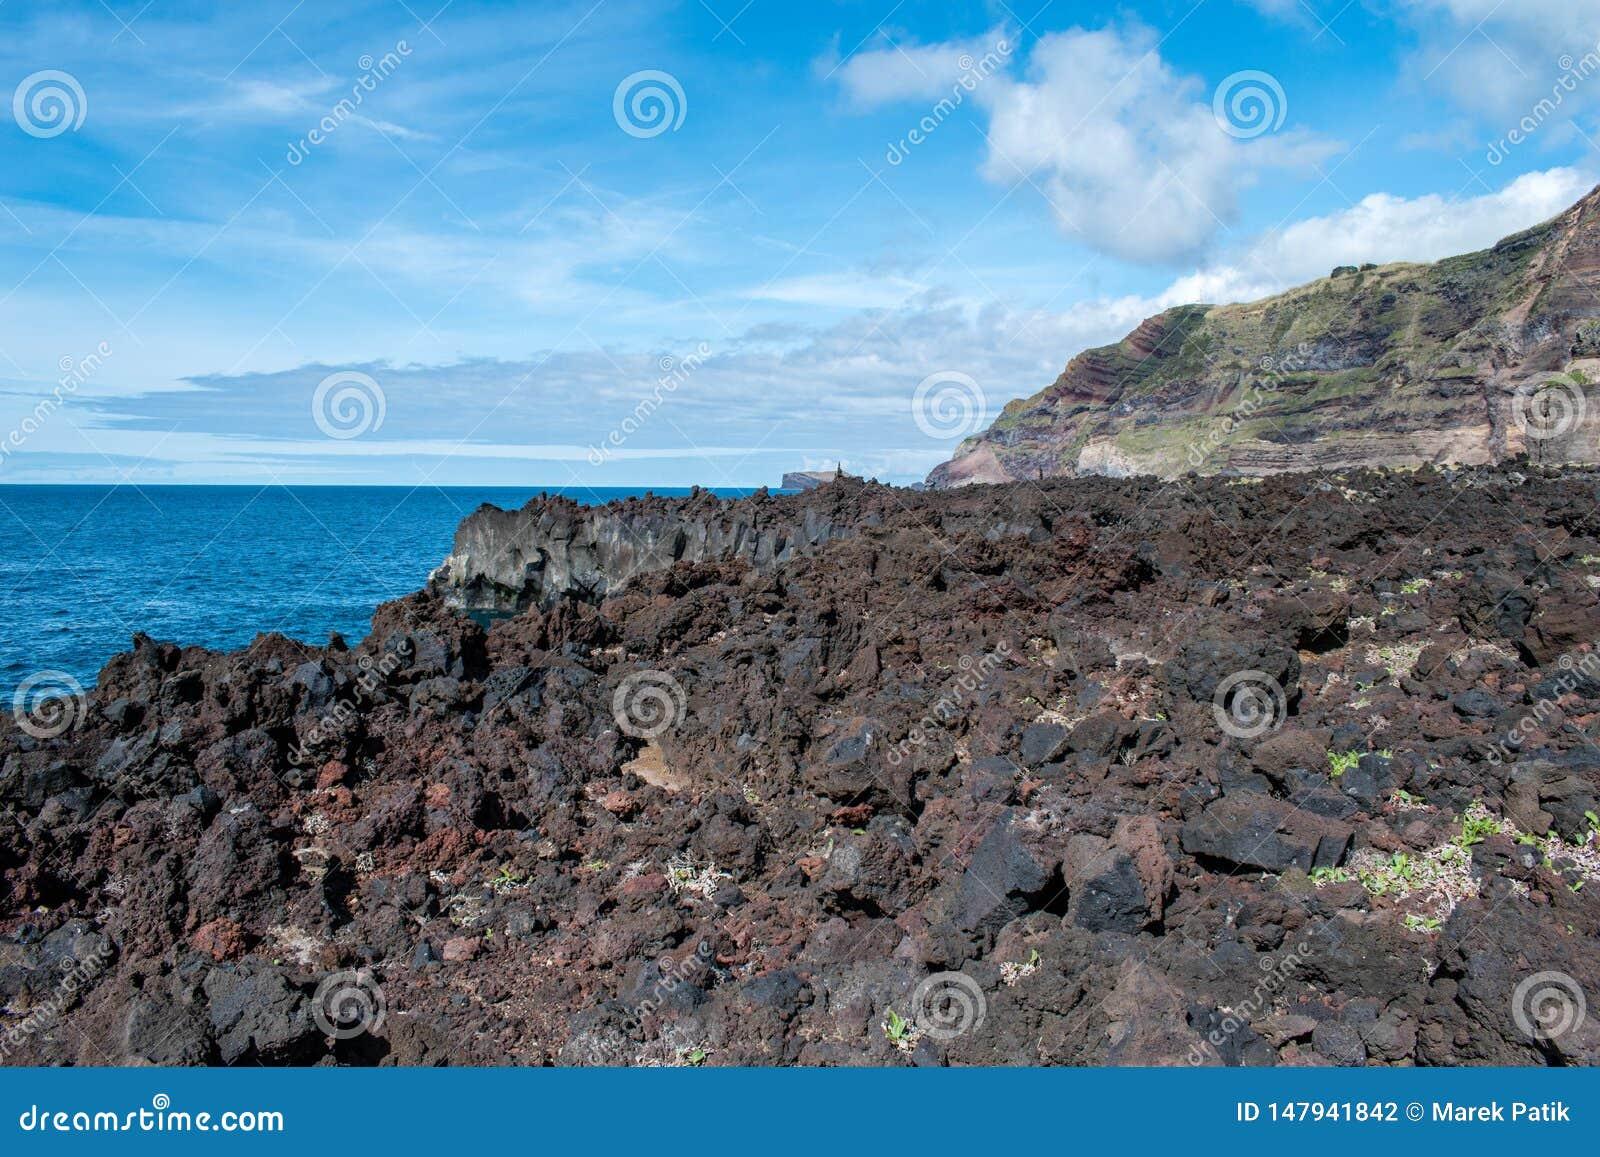 Lava coast at Ponta Da Ferraria,Azores